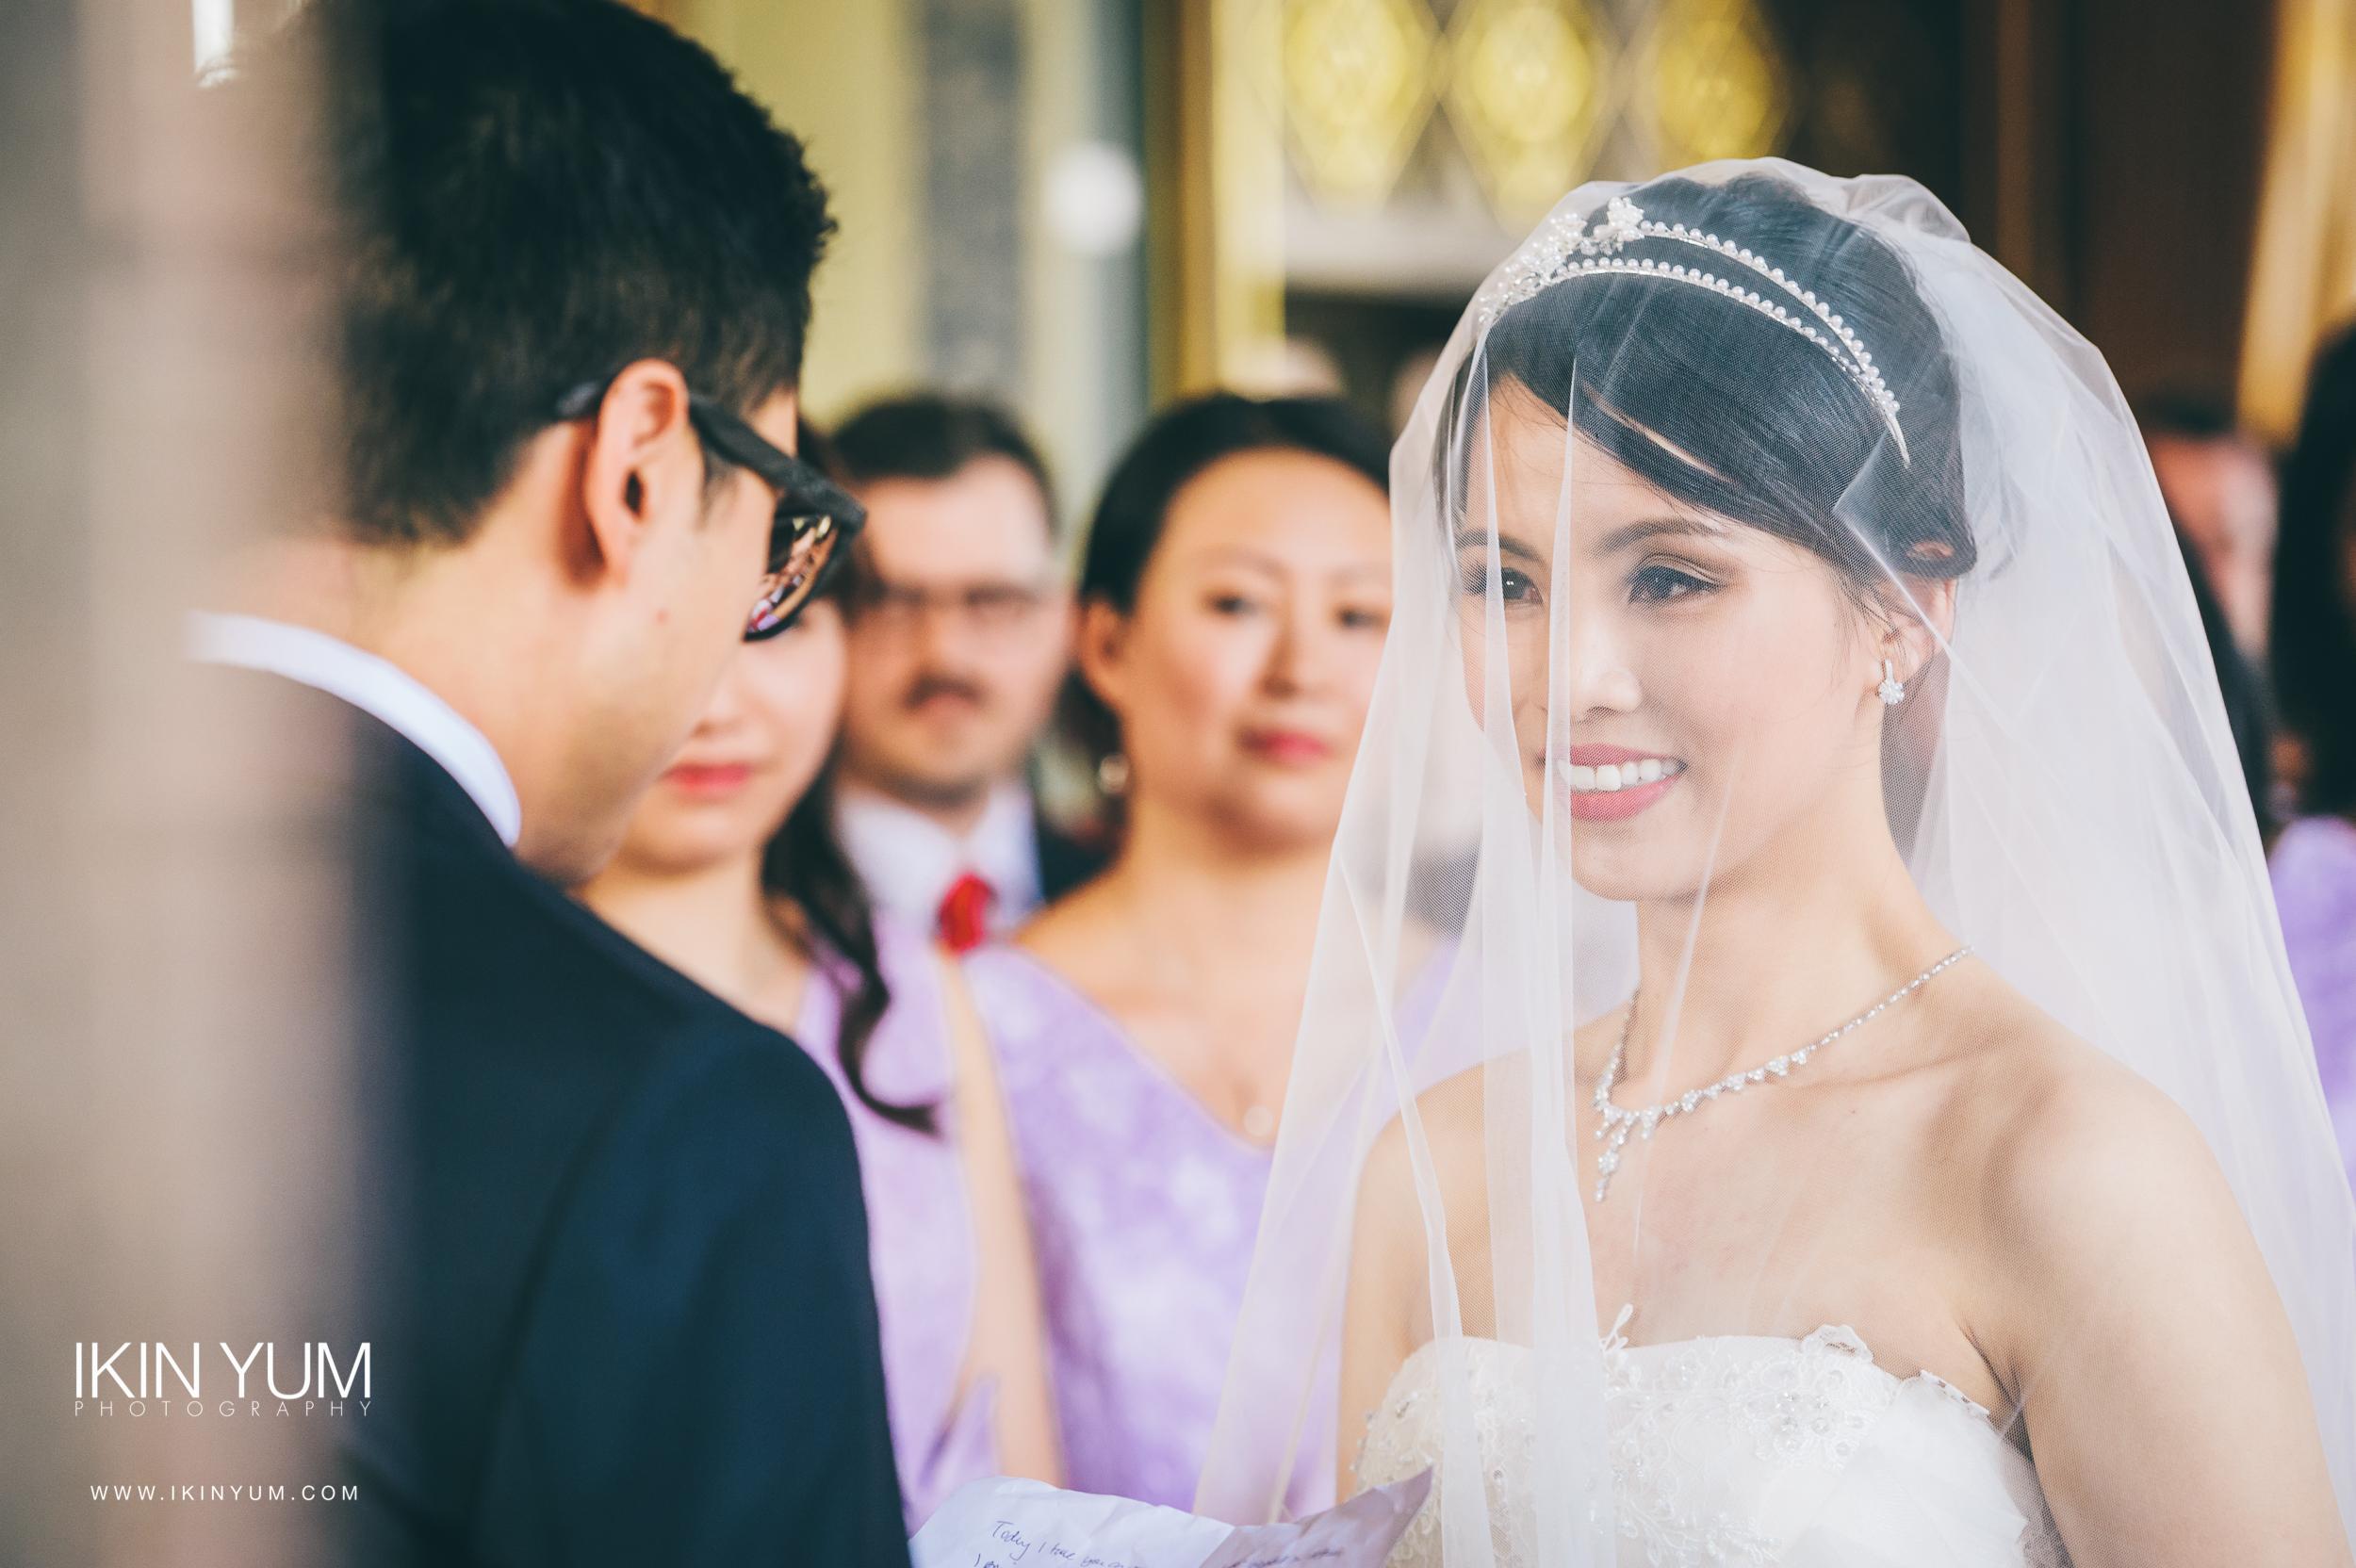 St Pancras Renaissance Hotel - Wedding - Ikin Yum Photography-095.jpg